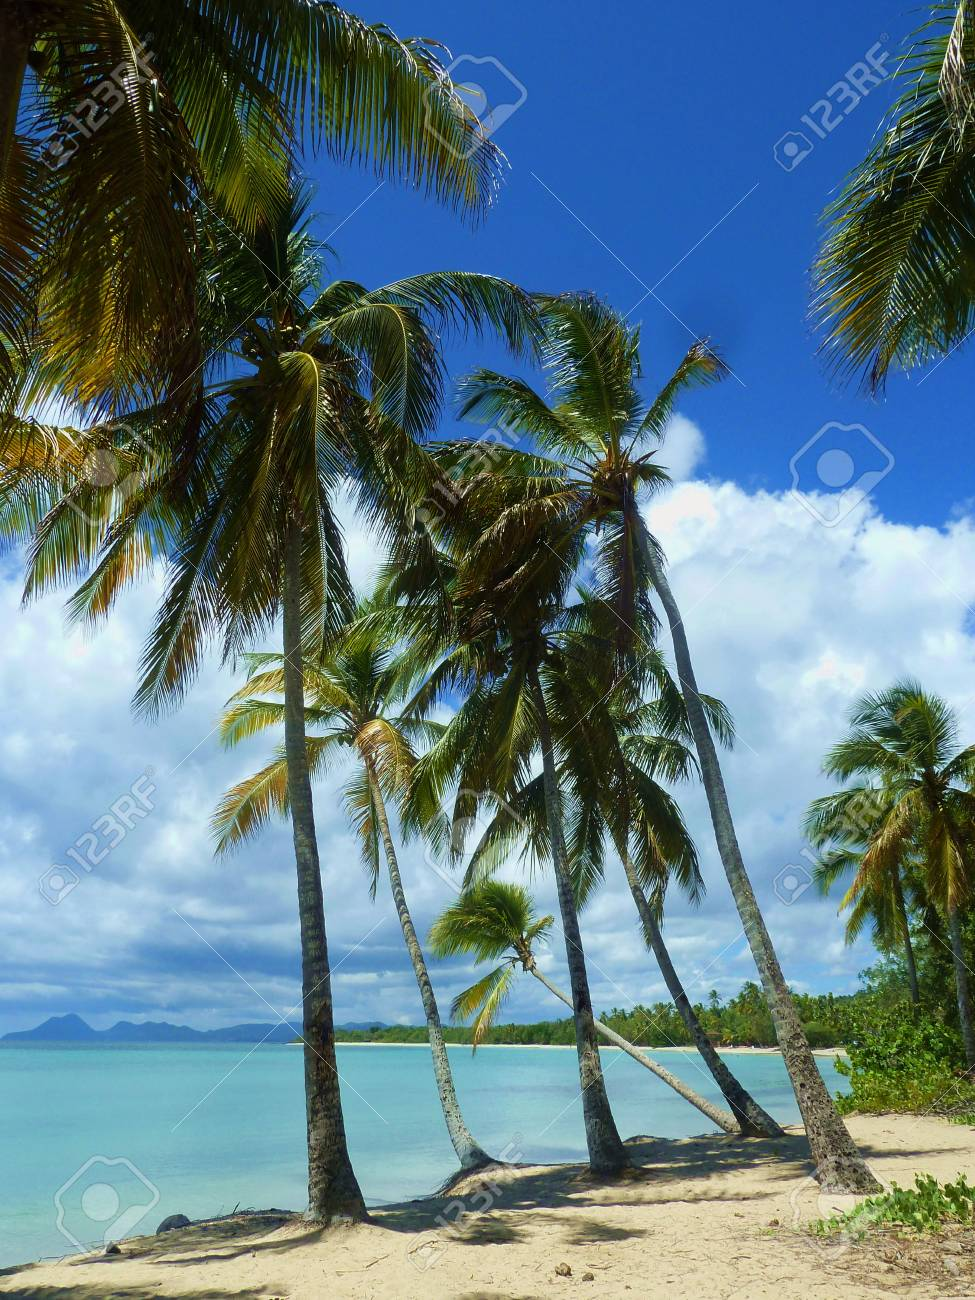 palms on the beach Stock Photo - 50310028